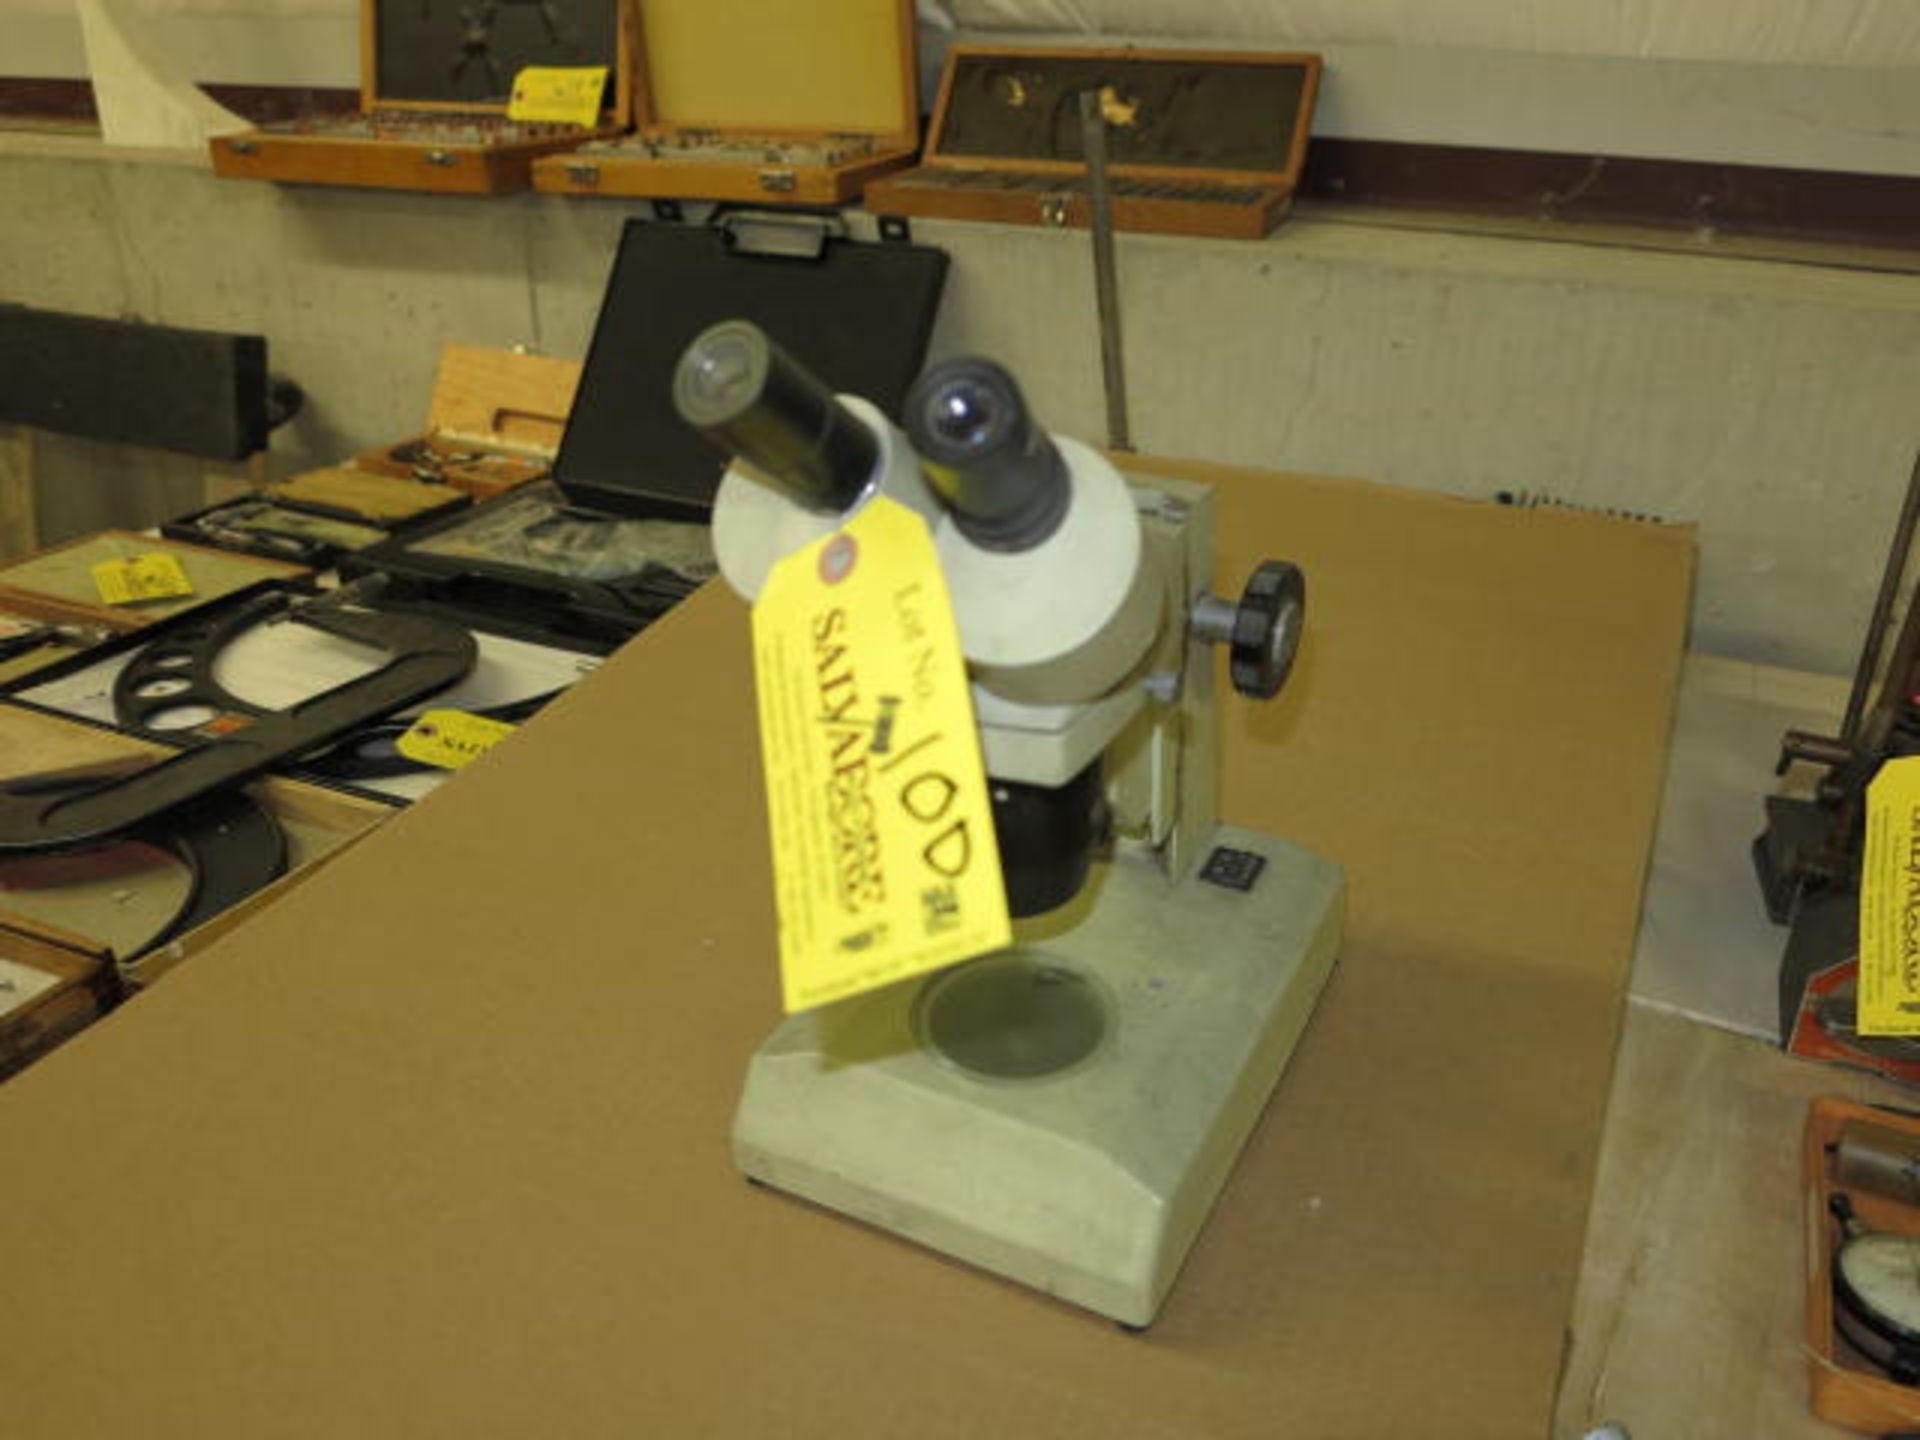 Lot 100 - 3X Stereo Microscope Location: Elmco Tool 3 Peter Rd Bristol, RI